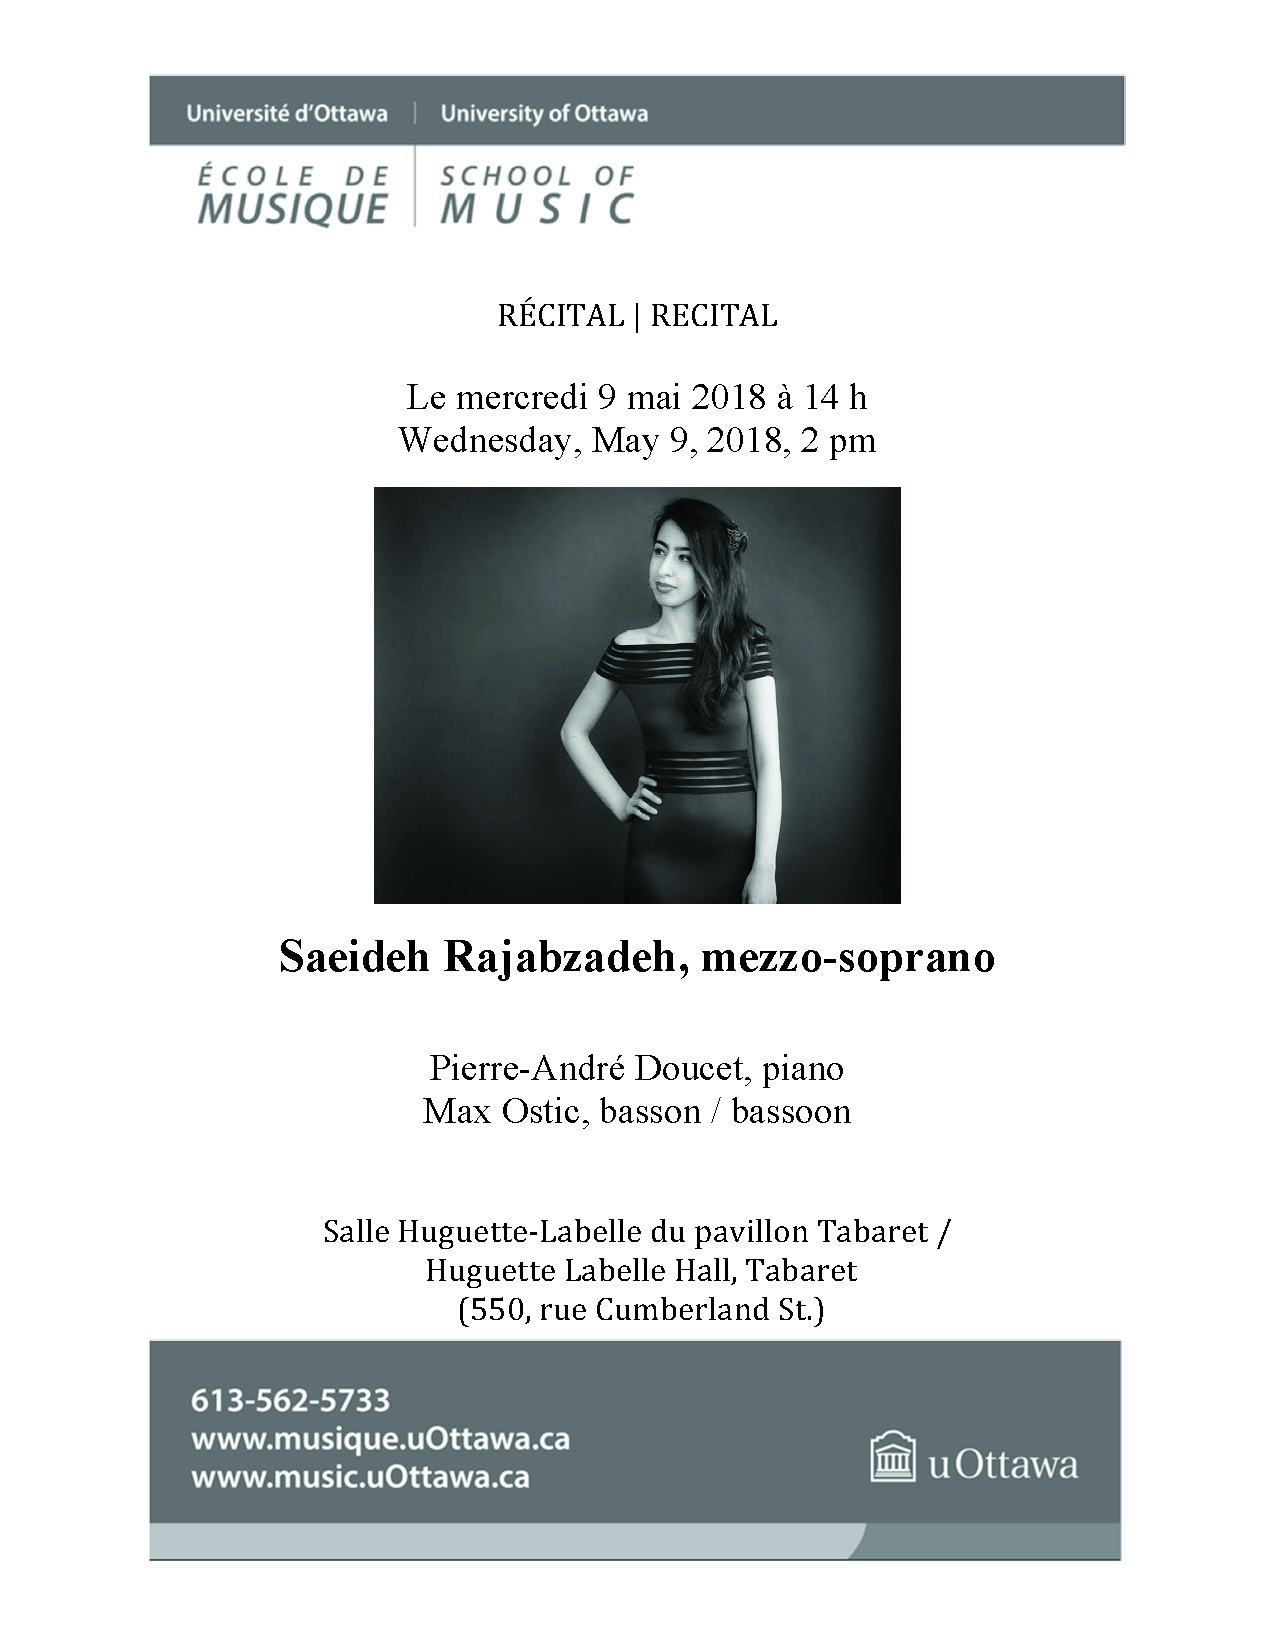 Page 1 of Saeideh Rajabzadeh's recital program